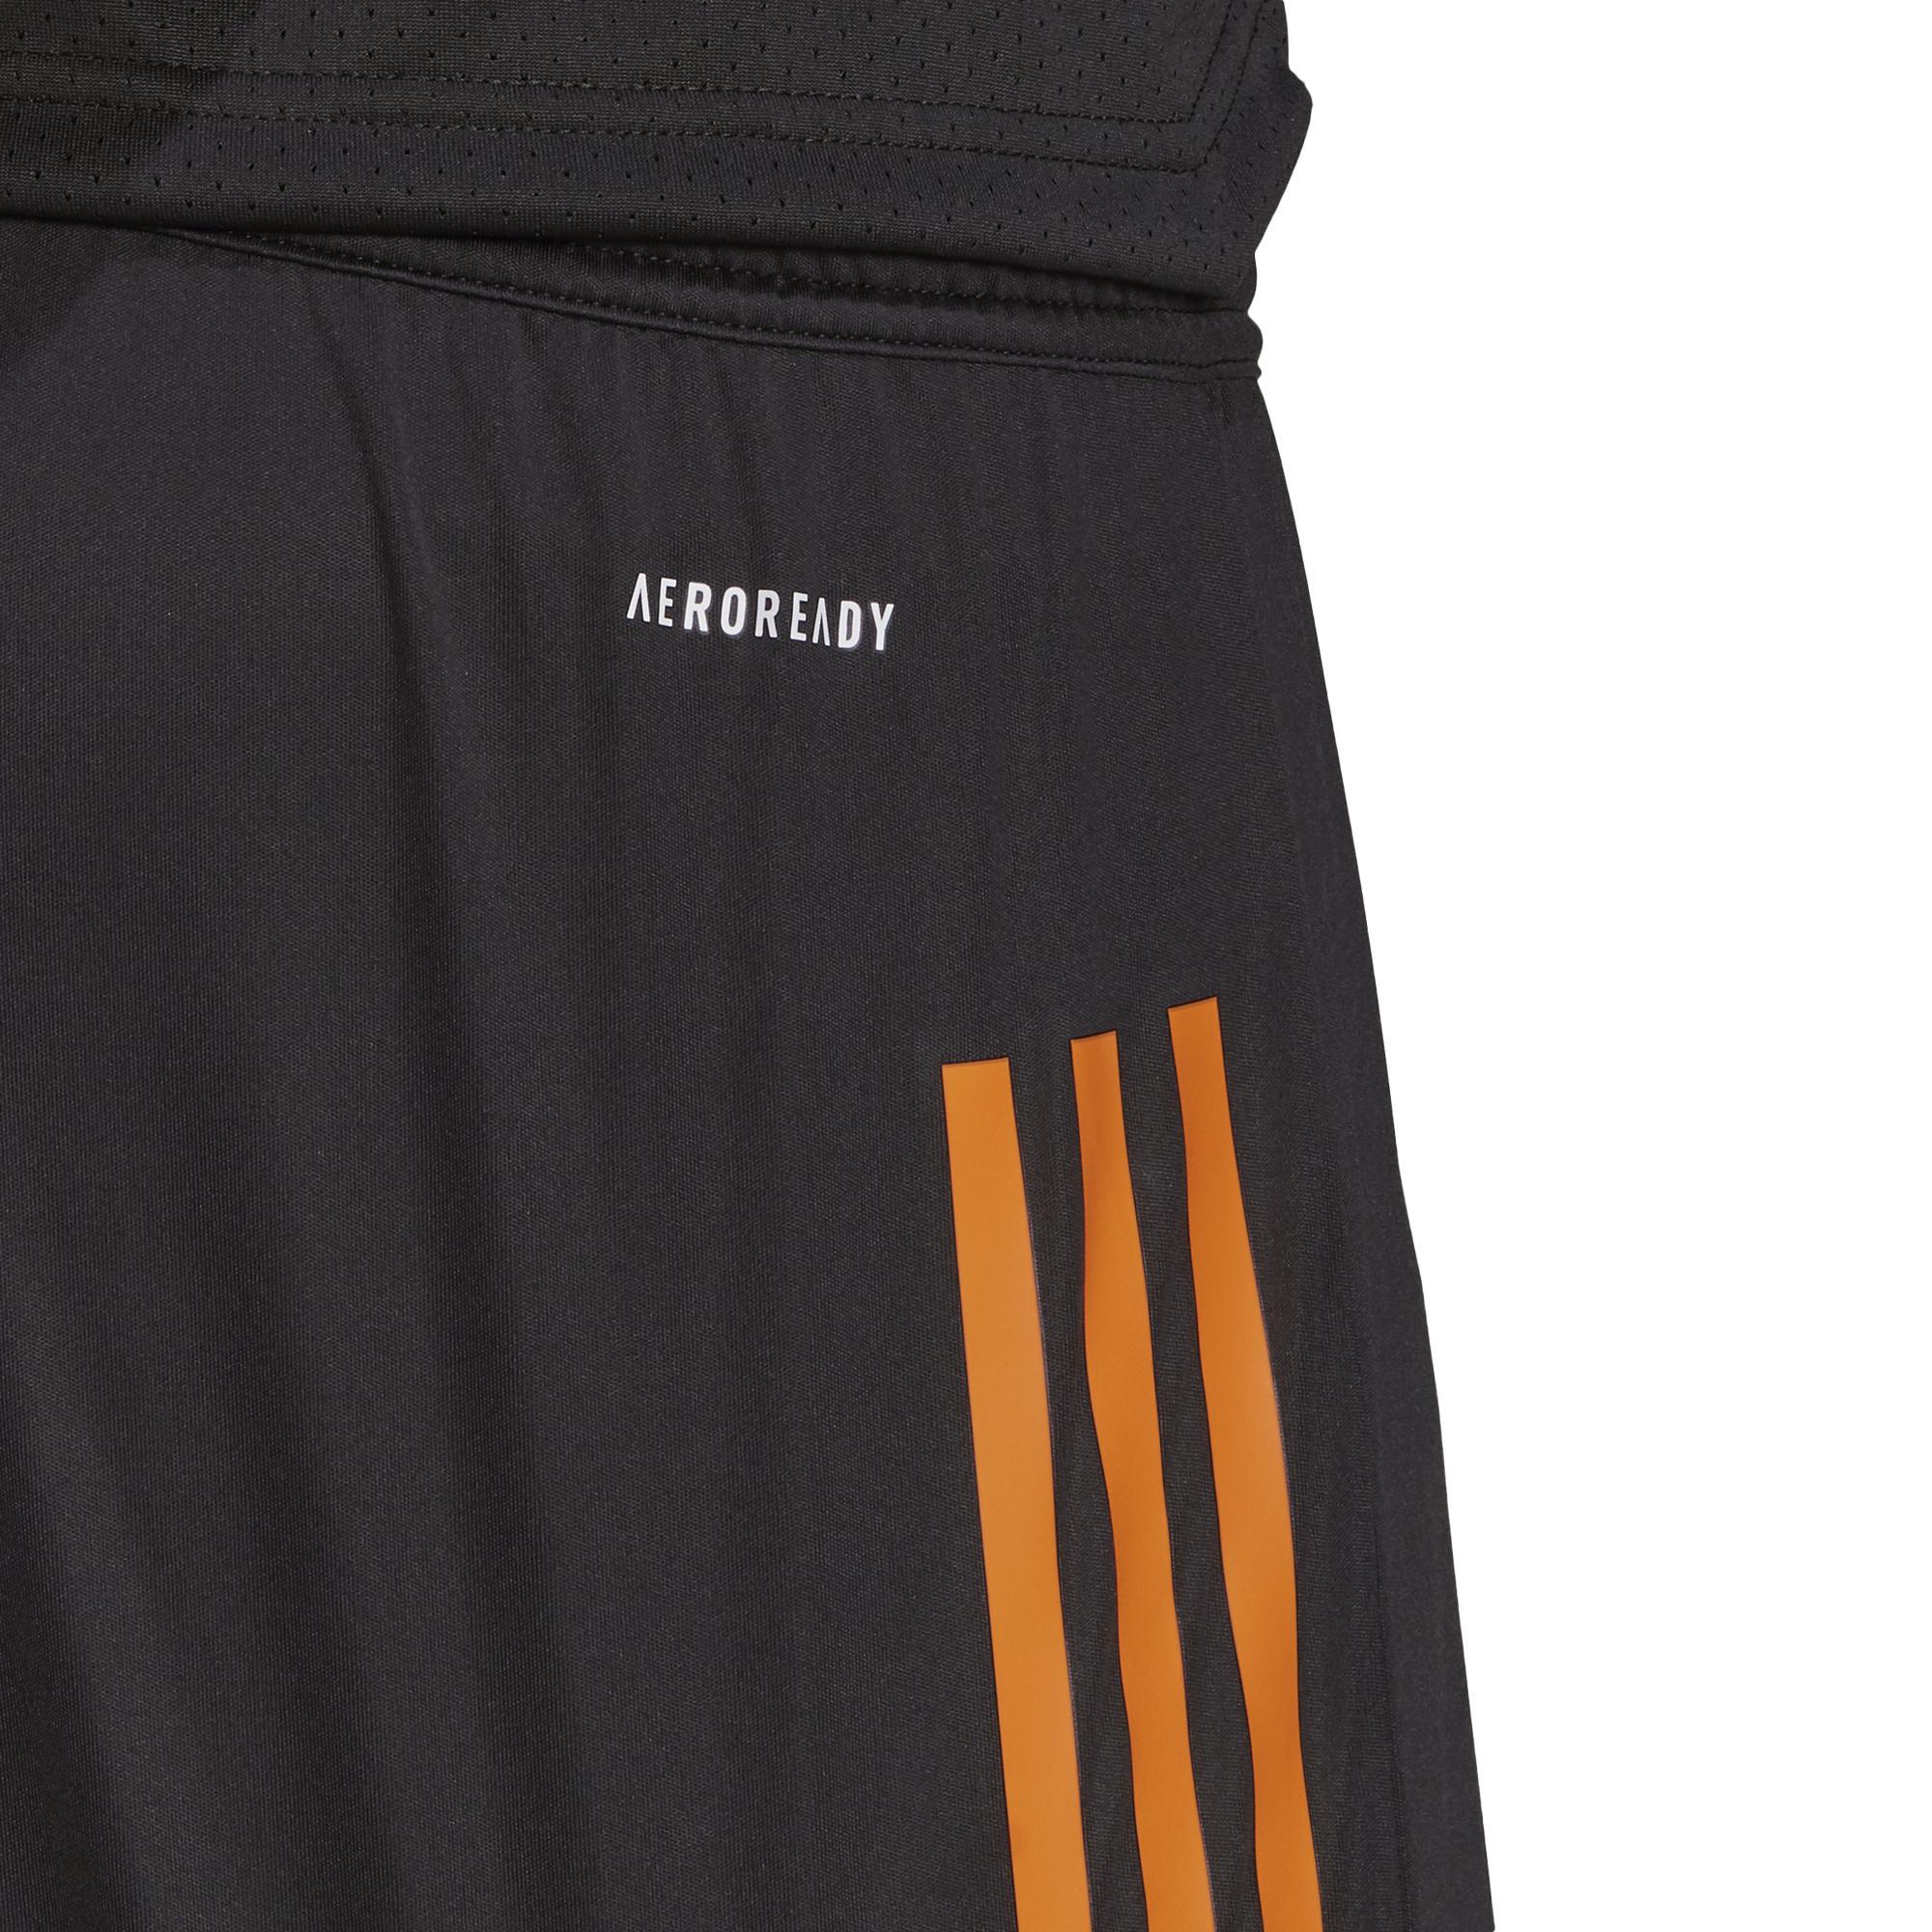 Adidas ADIDAS Manchester United Training Short '20-'21